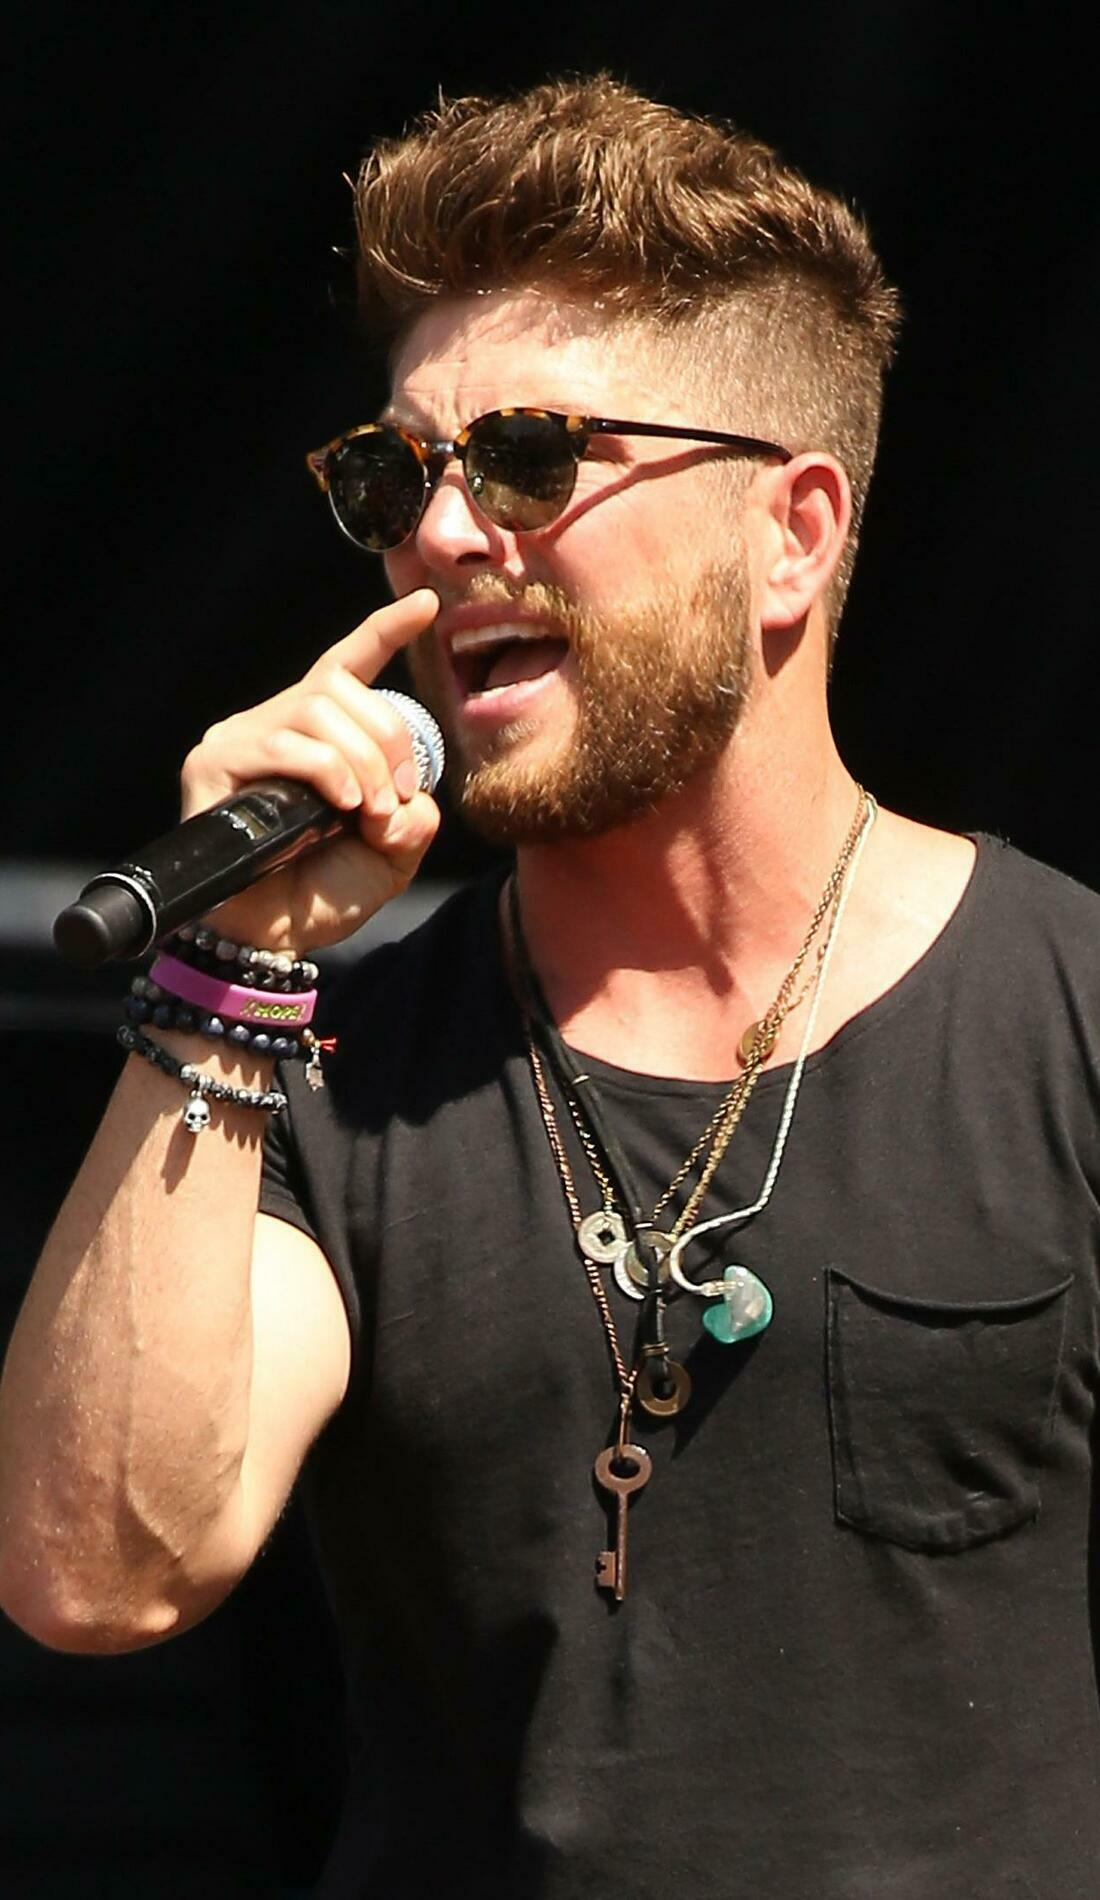 A Chris Lane live event